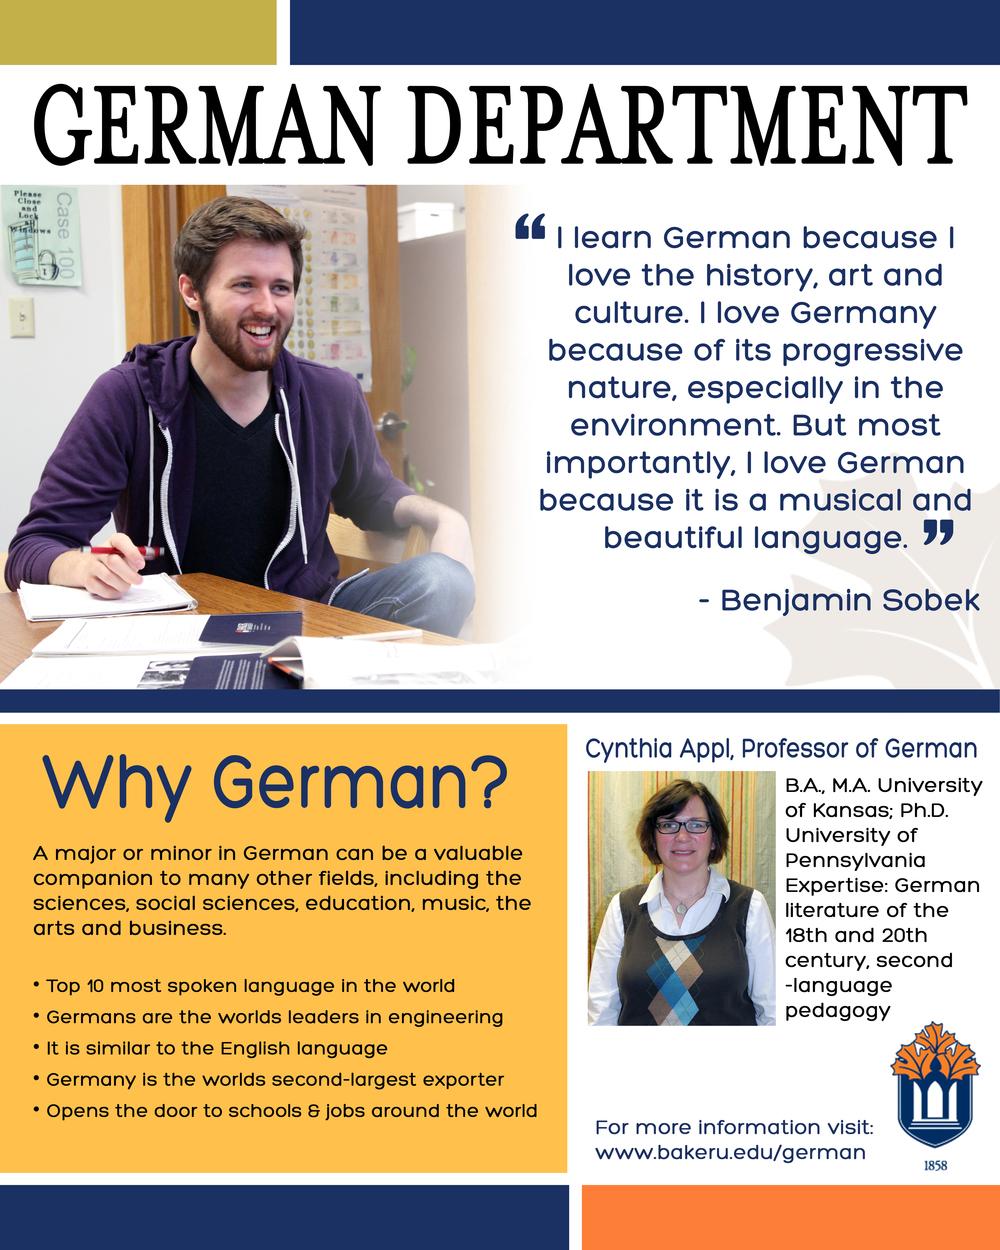 Geman Humanities Poster.jpg